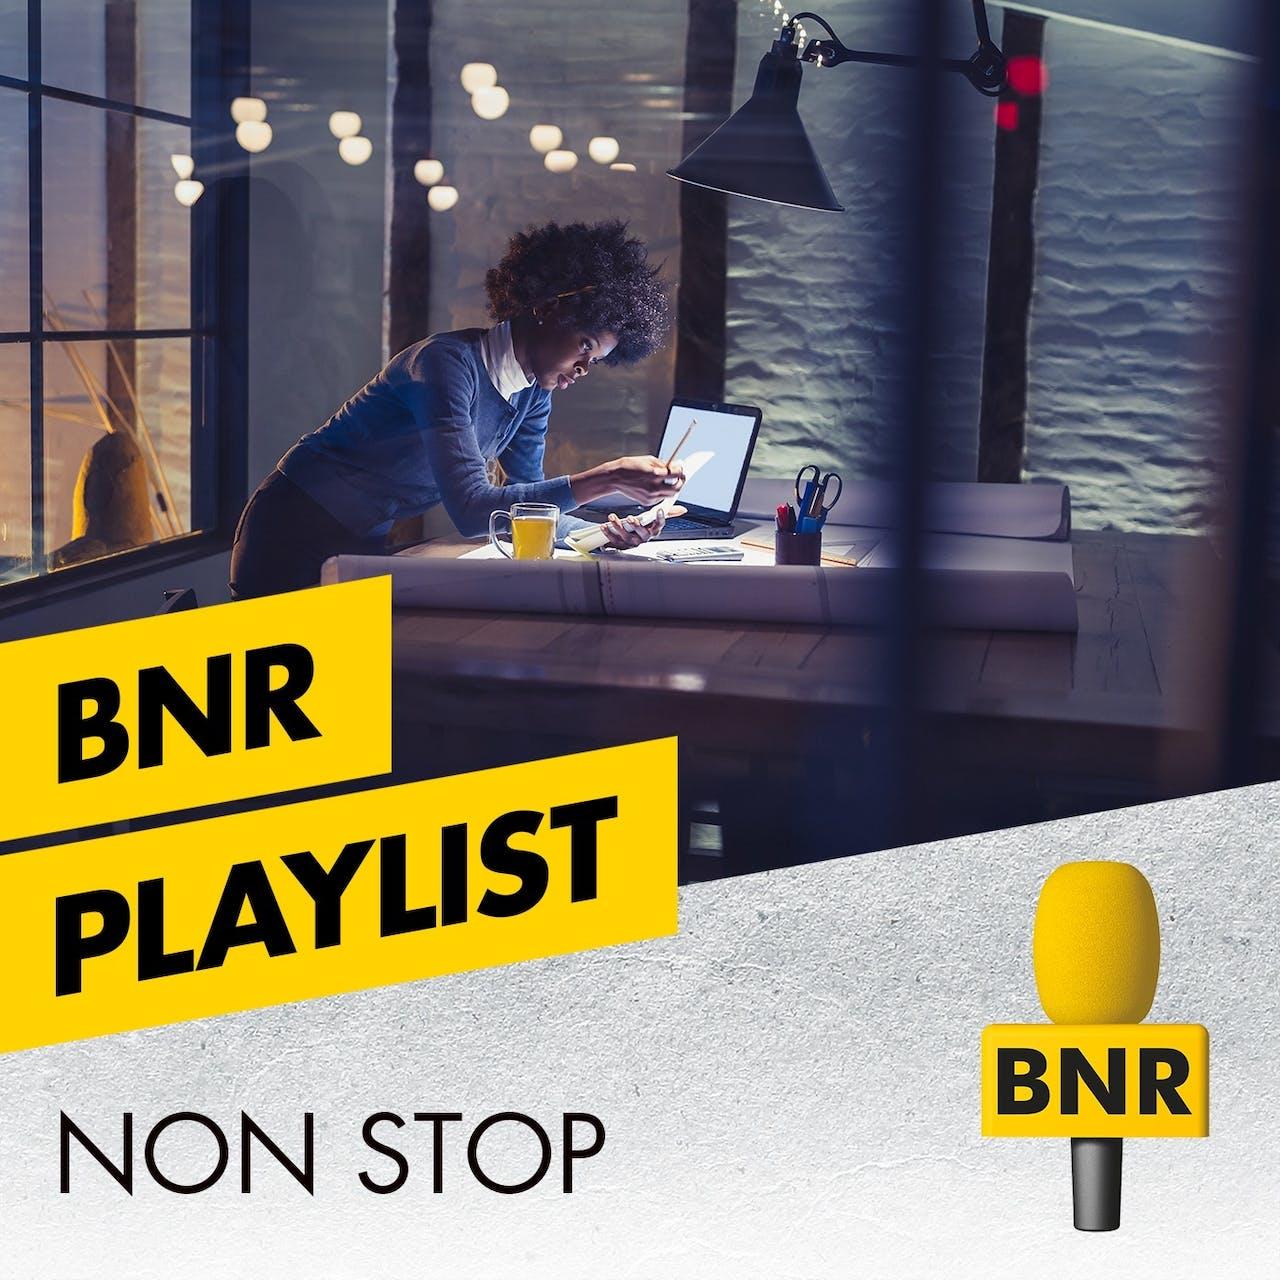 BNR Playlist